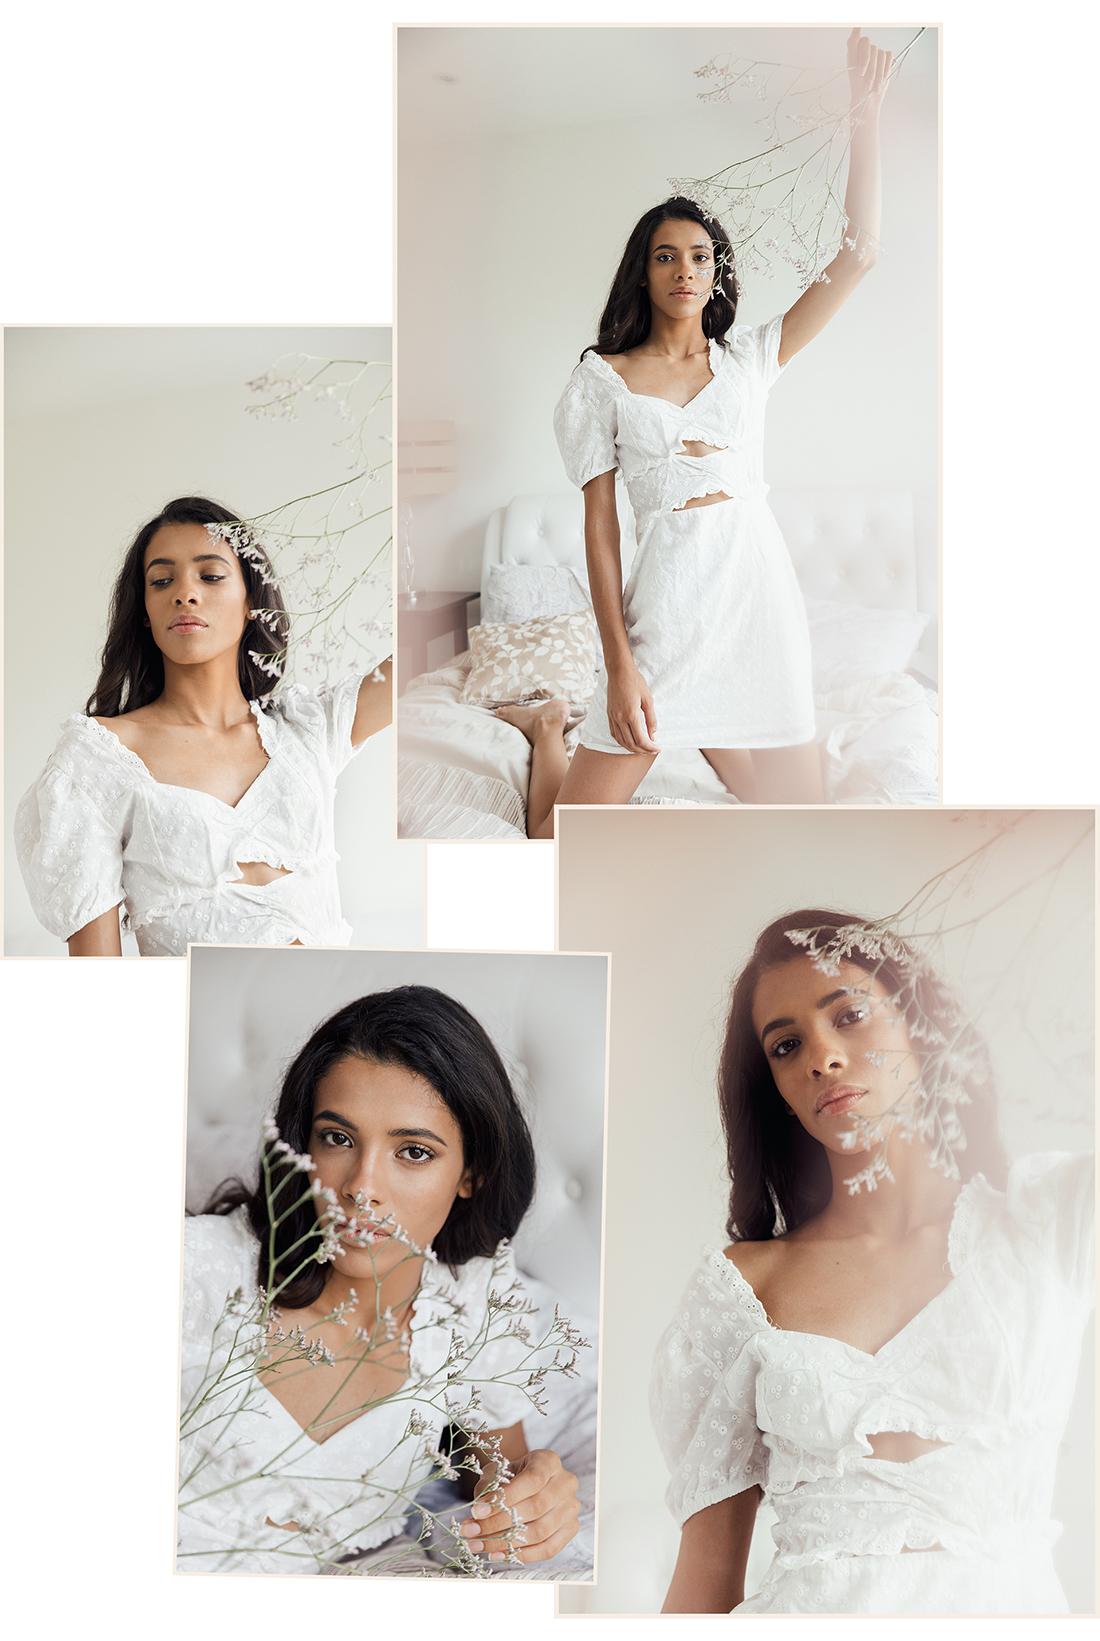 Soft dreamy collage of Beatriz @ PRM agency by Ailera Stone